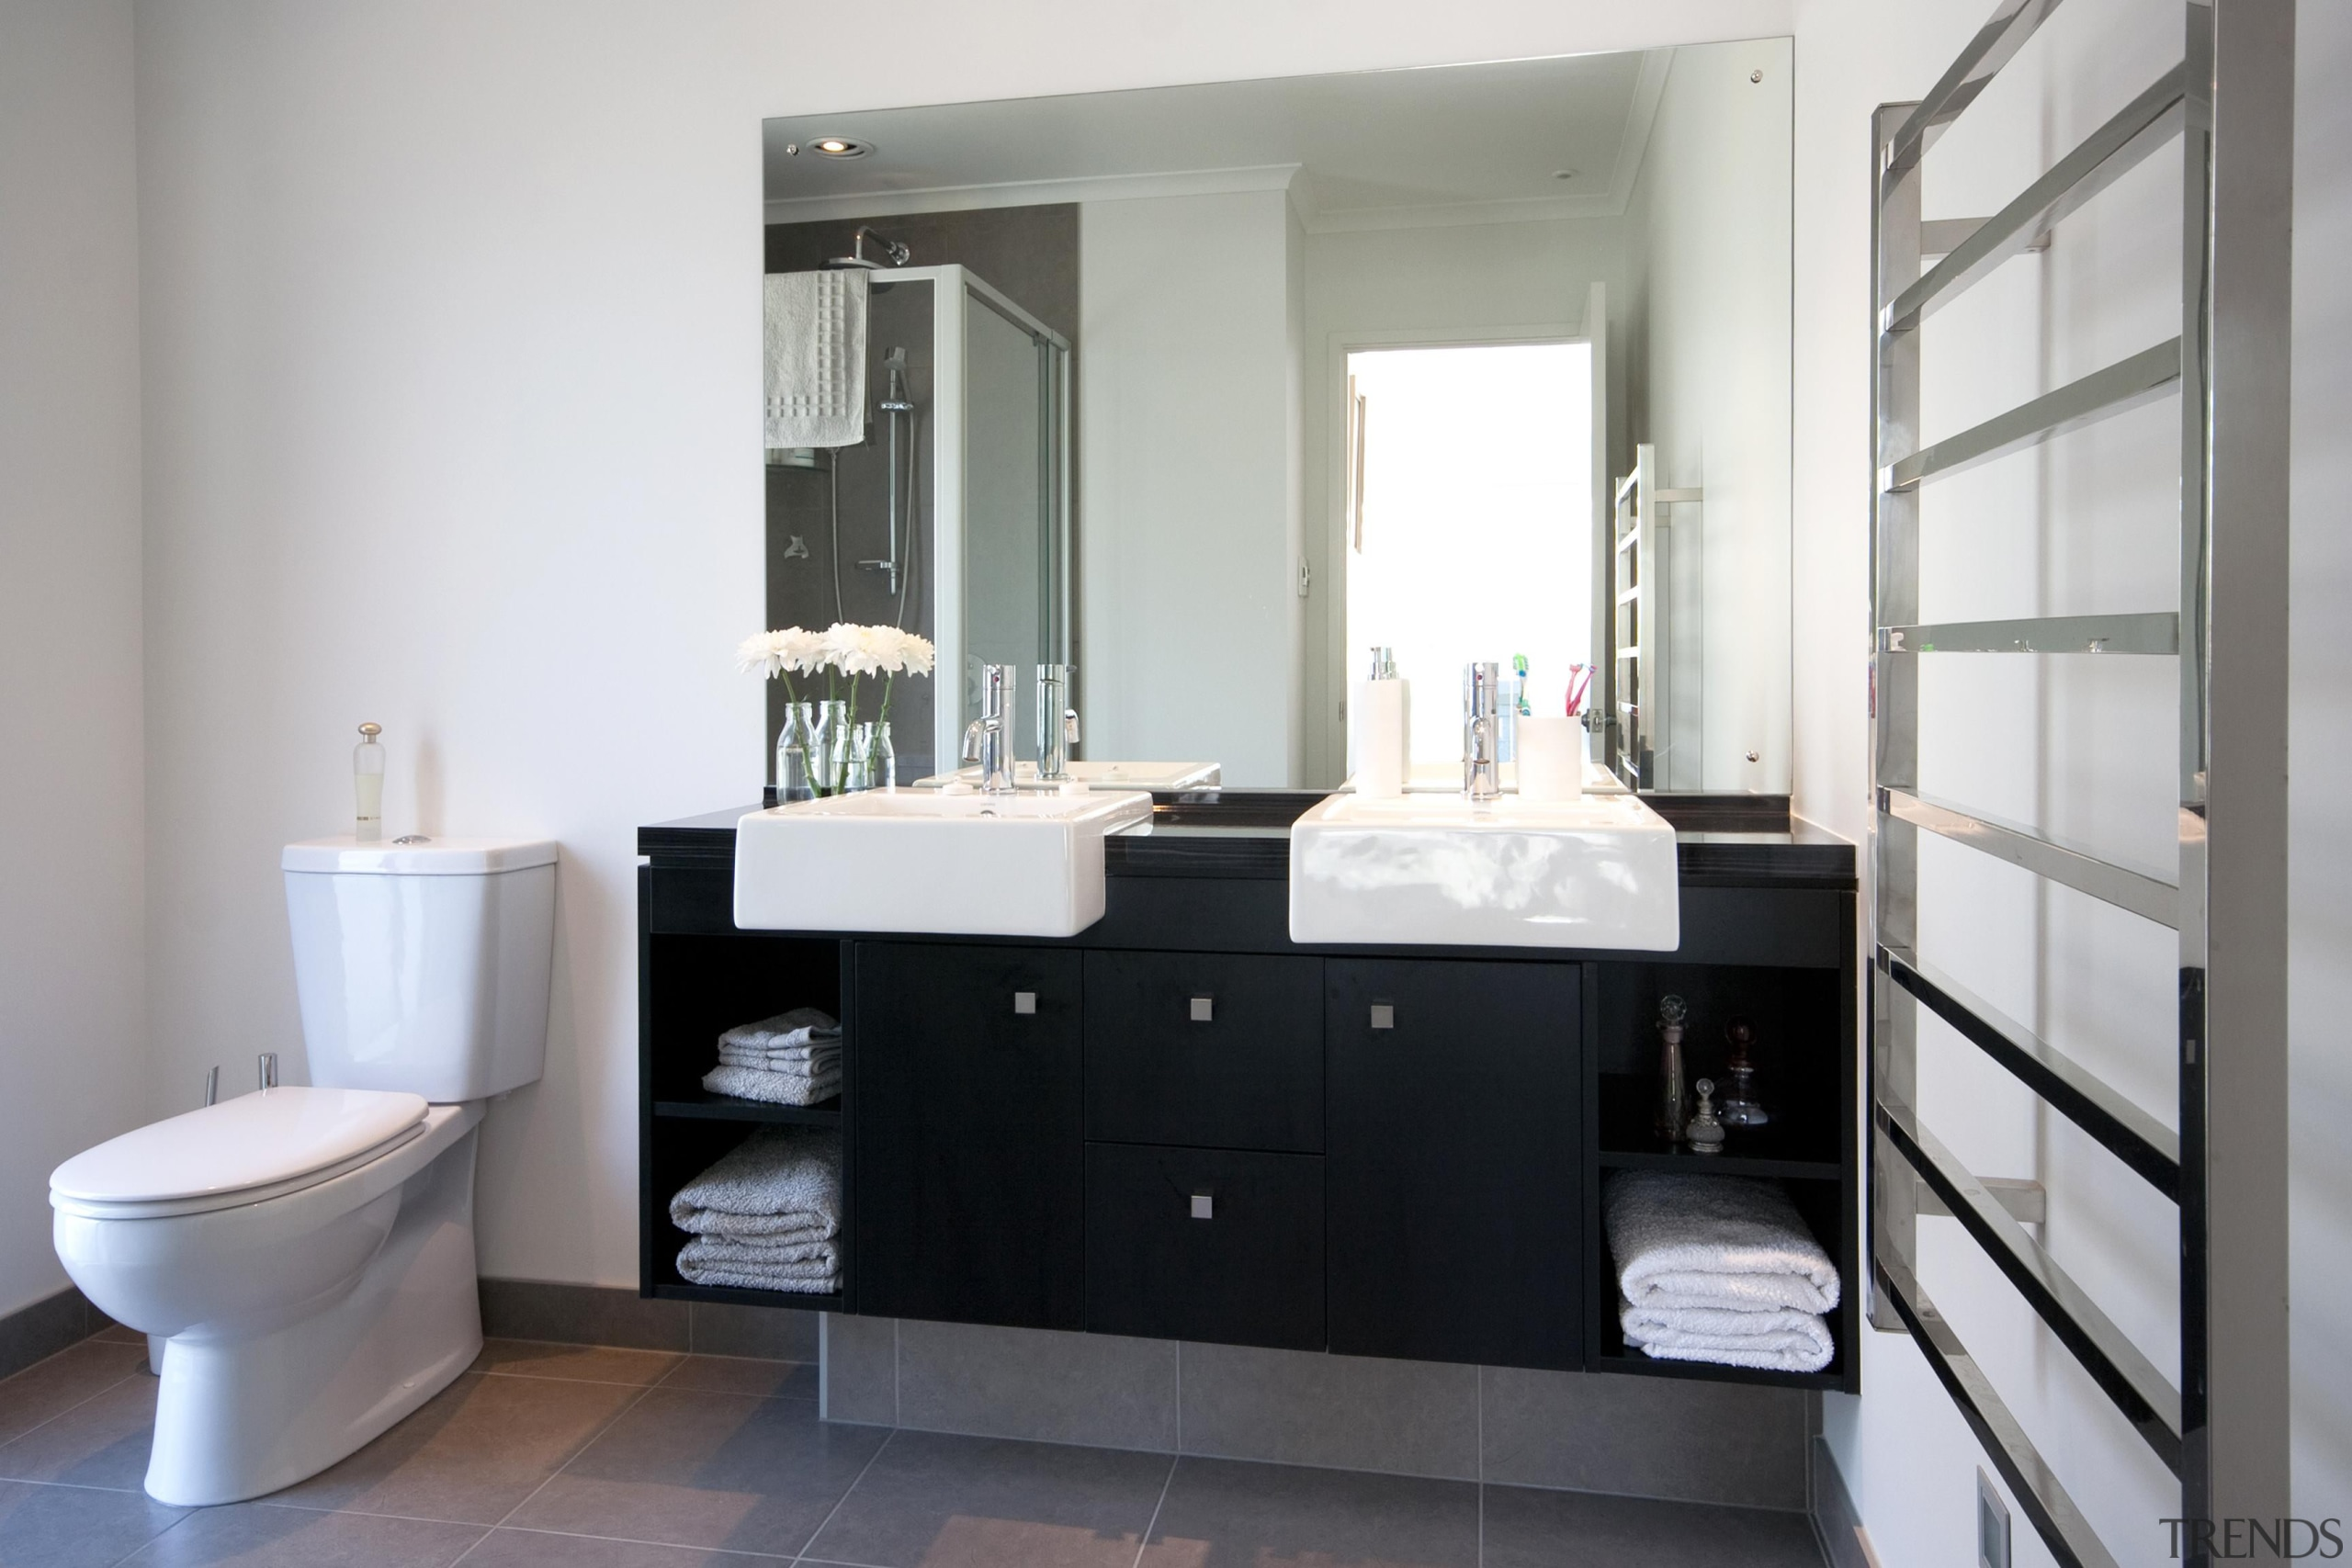 Bathroom Greers ShowhomeFor more information, please visit